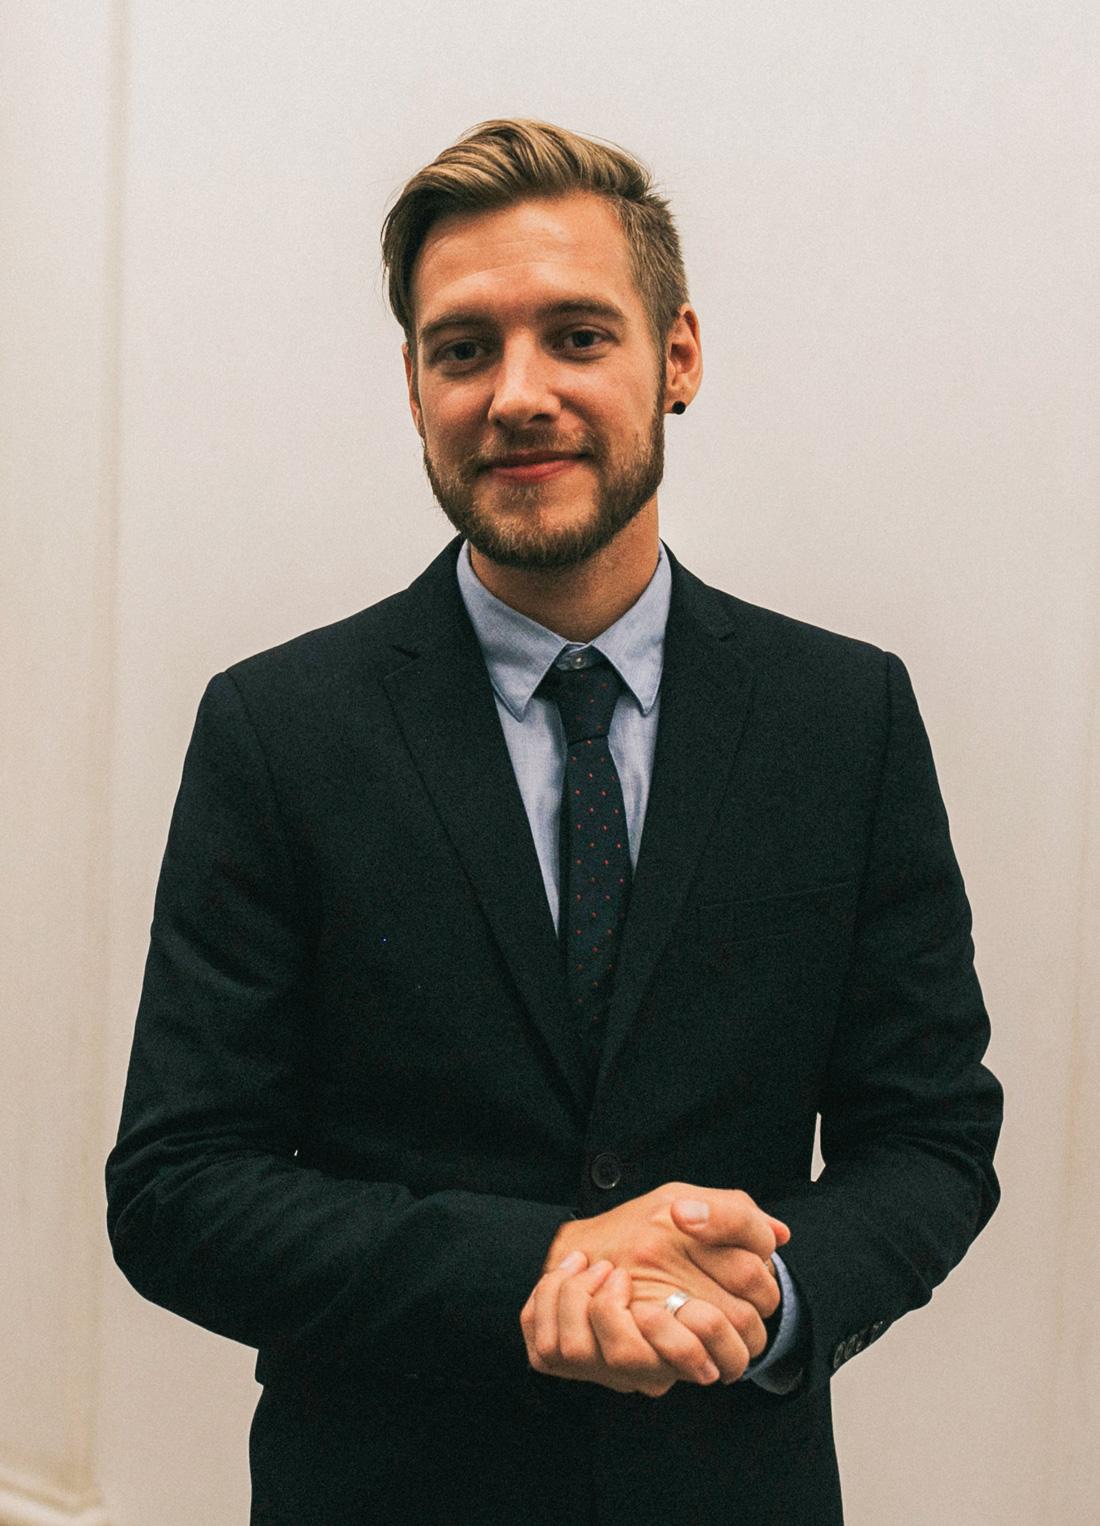 Photo of Stephen Iwaszko of Stephen i Studios by Romi Burianova